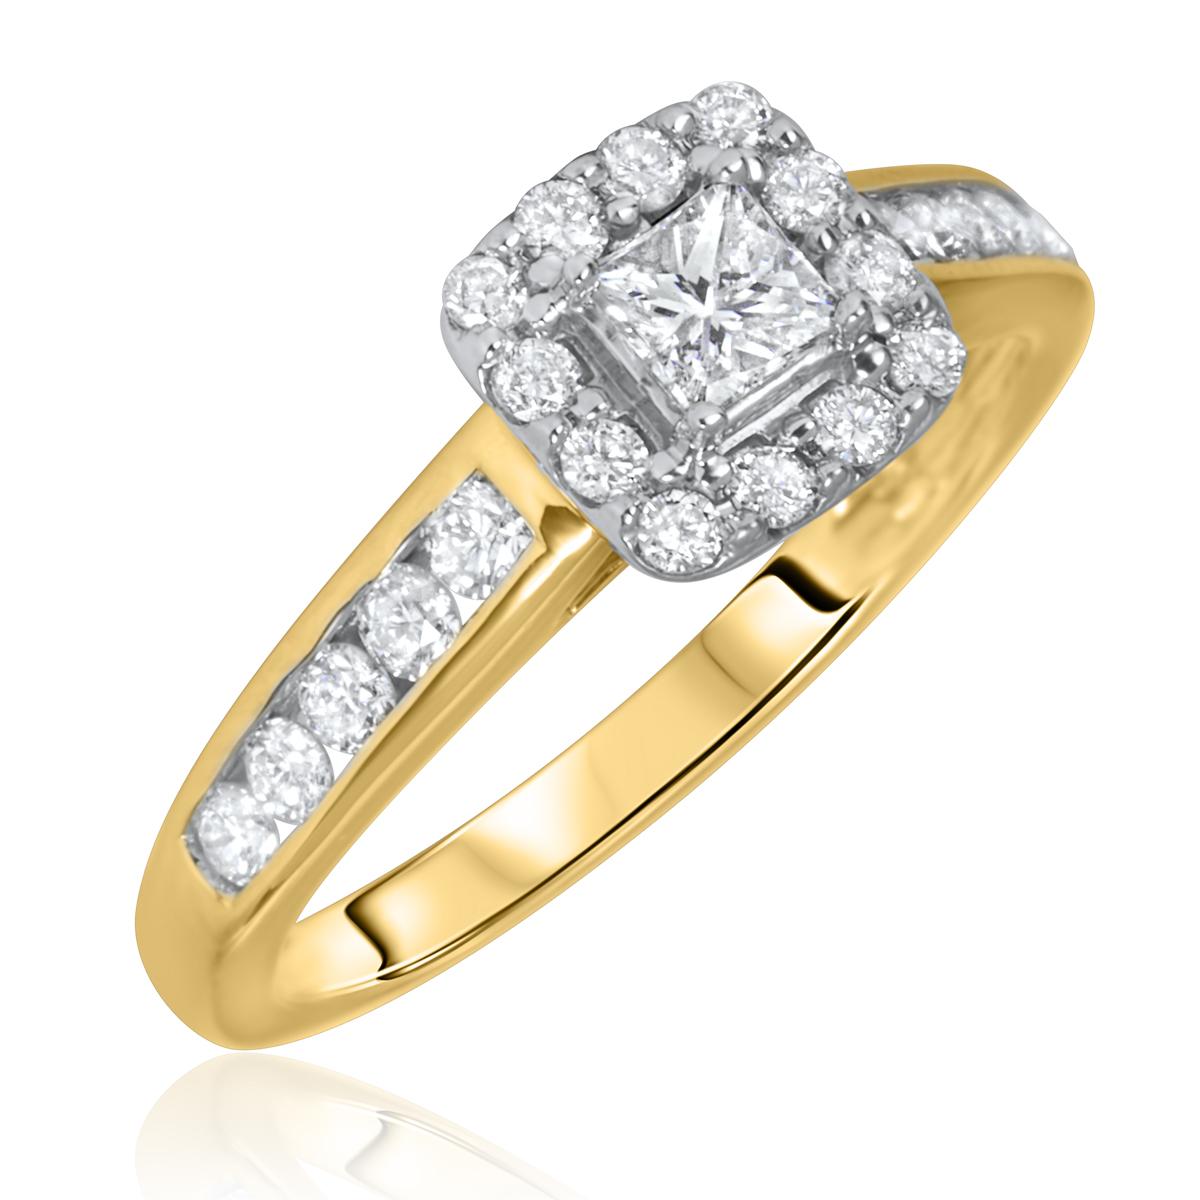 3/4 Carat T.W. Princess, Round Cut Diamond Ladies Engagement Ring 14K Yellow